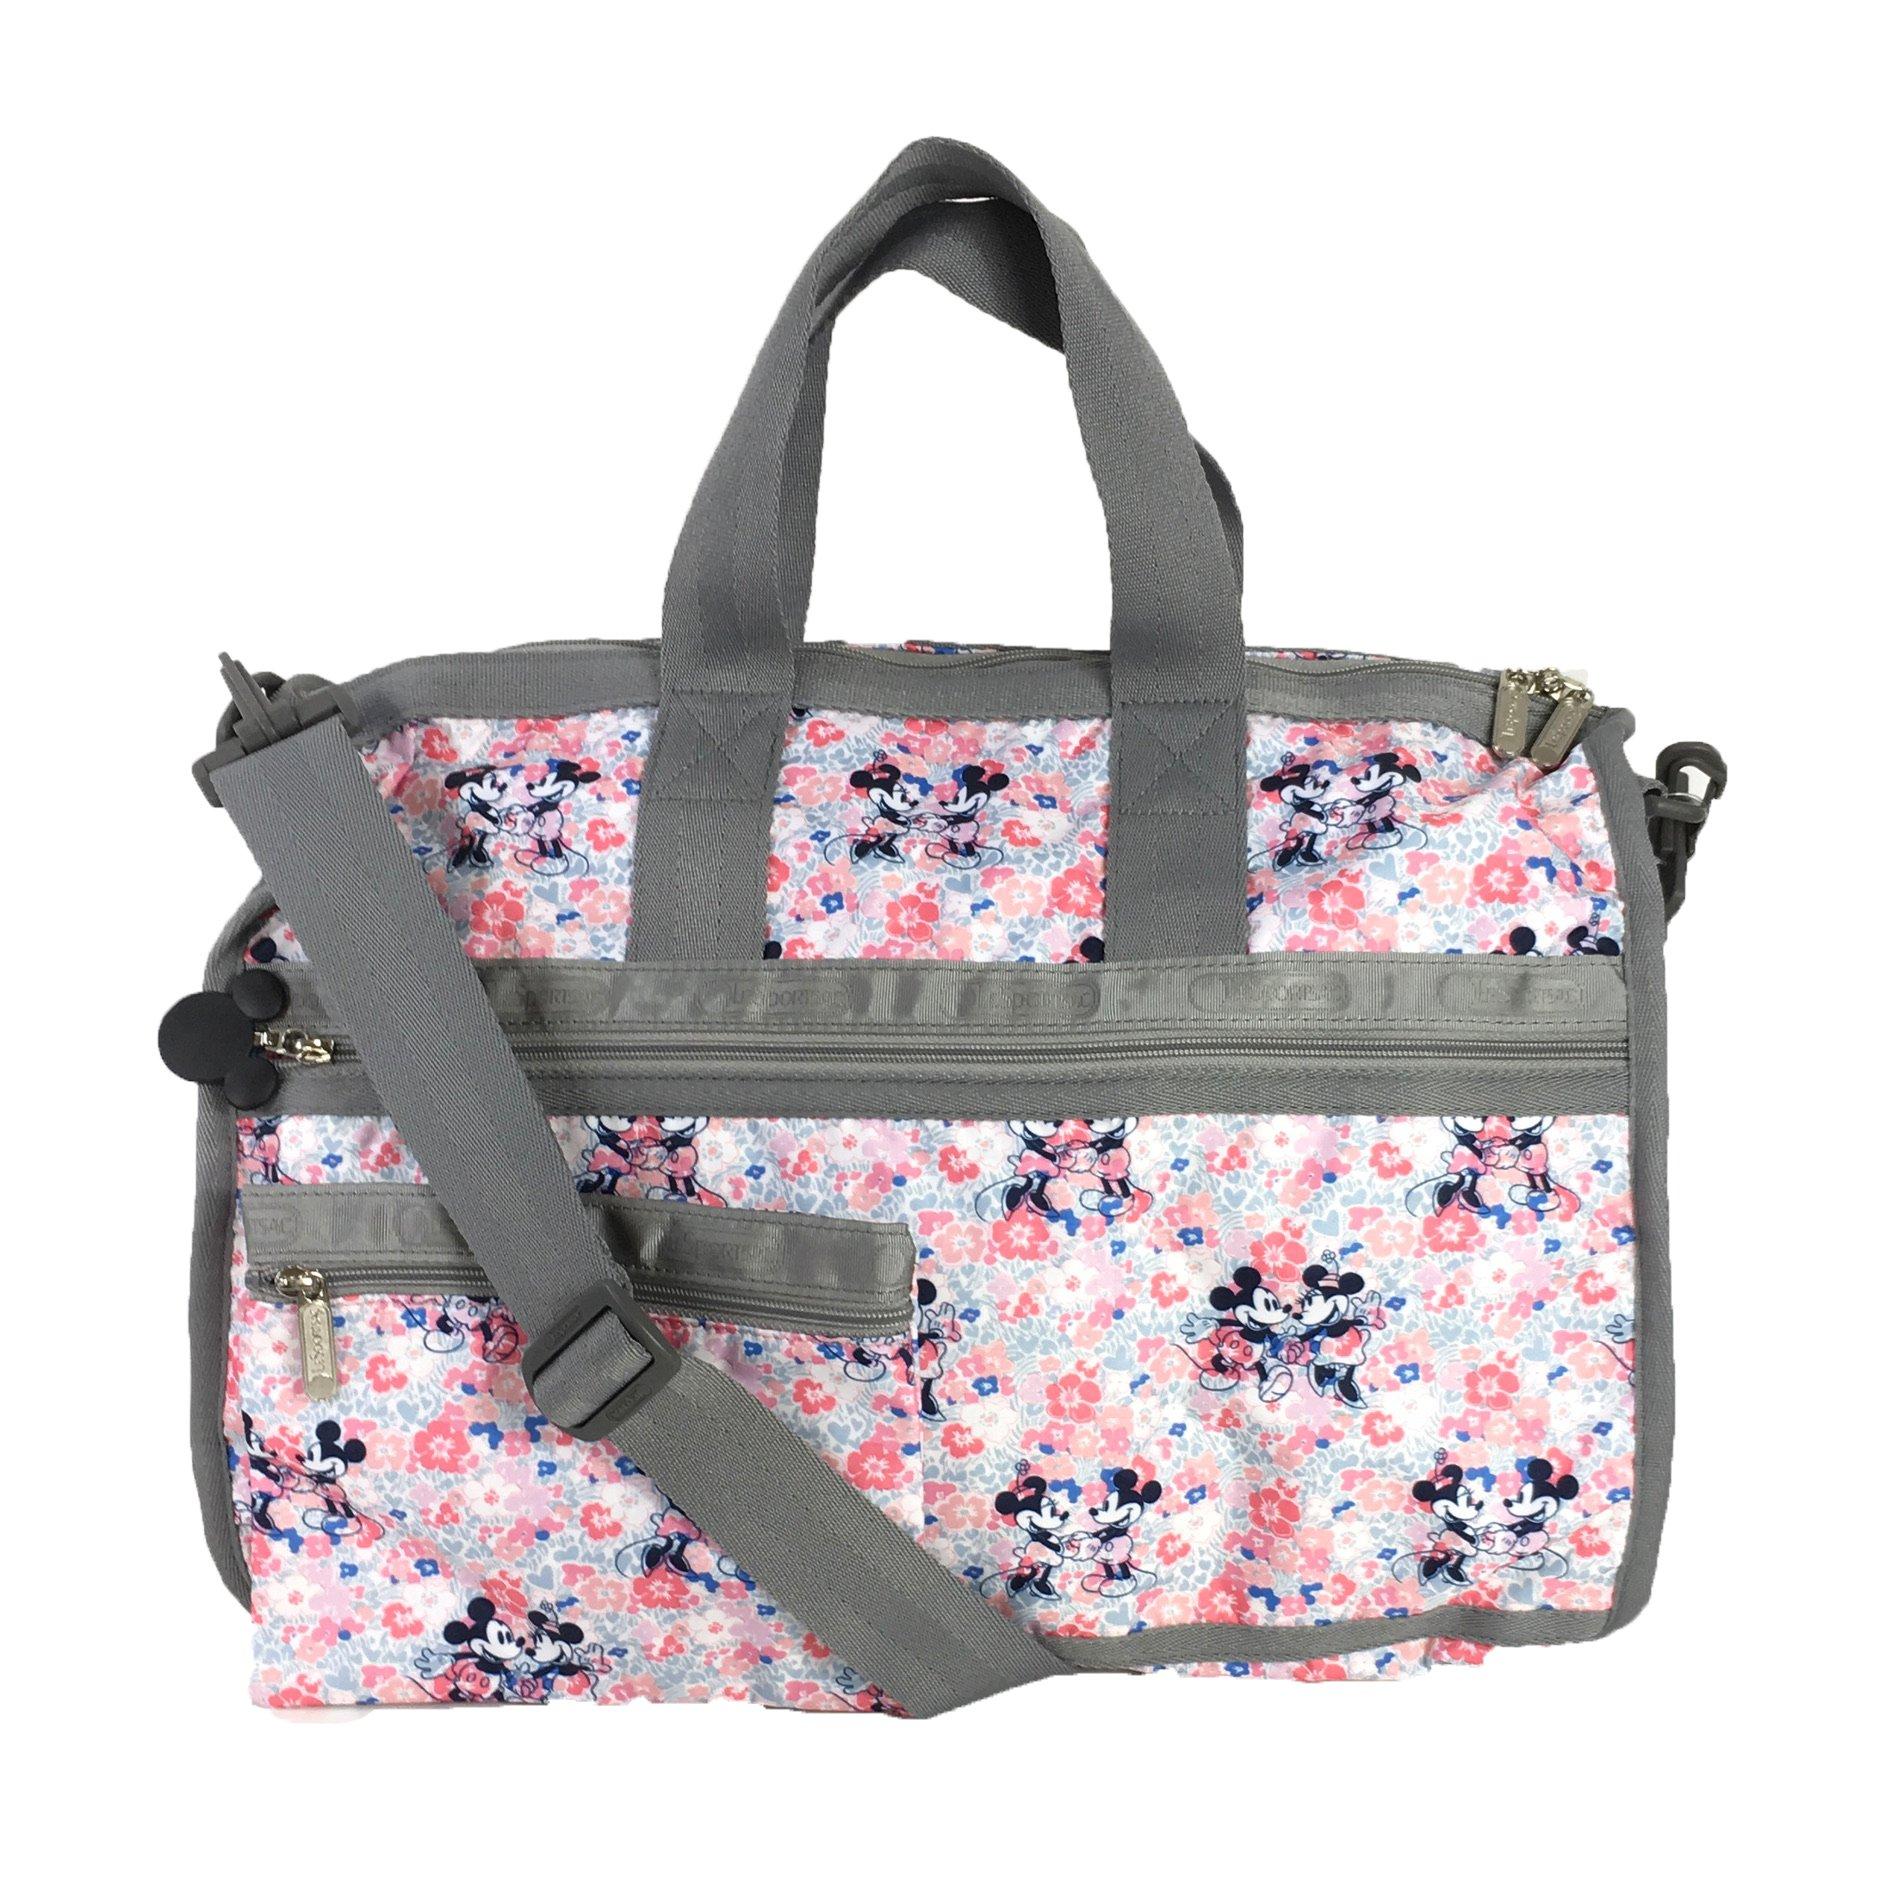 LeSportsac Disney Minnie Mouse Medium Weekender Duffel Bag, Spring Fling